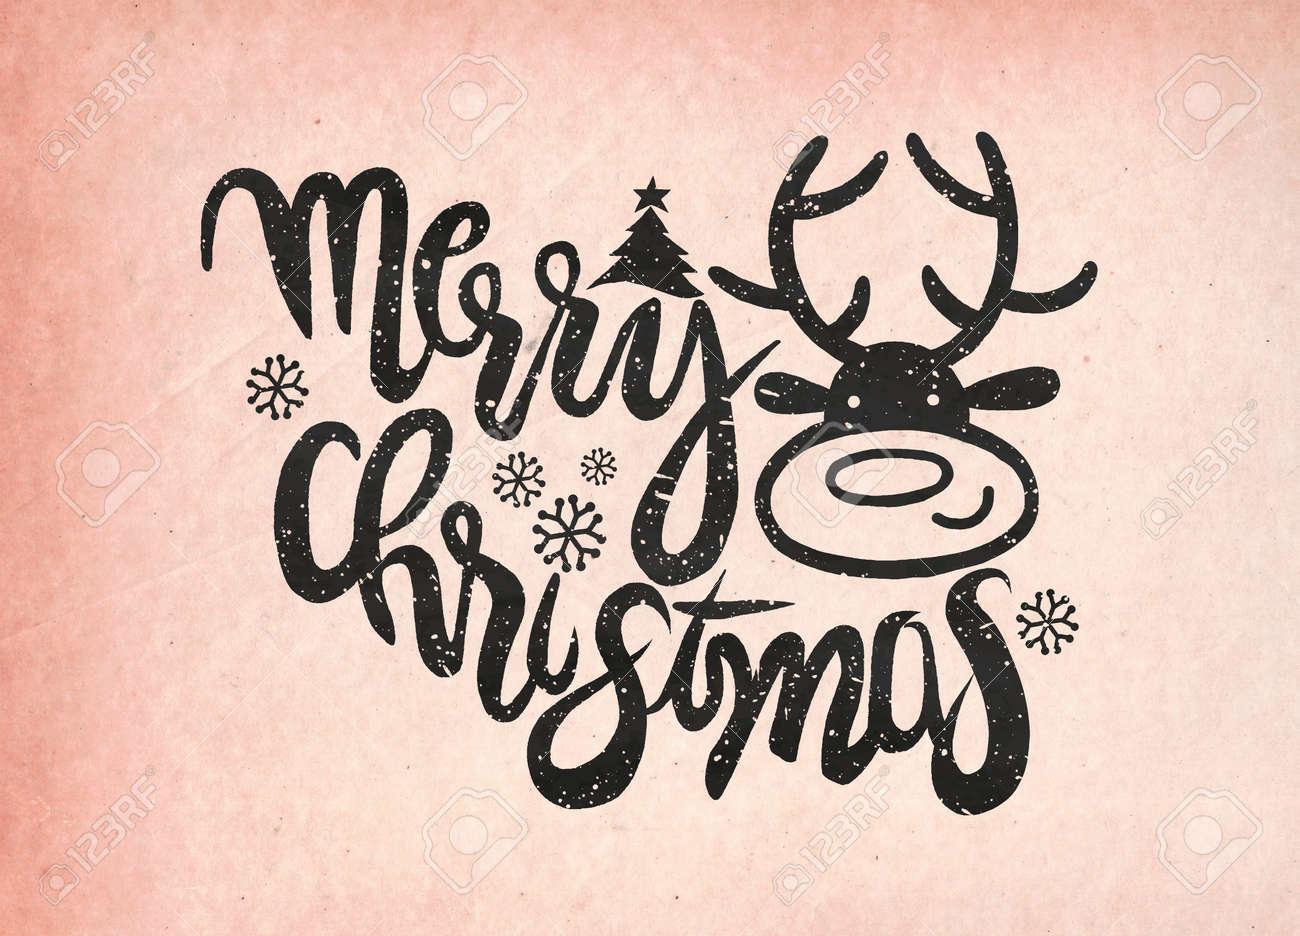 hand drawing cartoon character merry christmas vector christmas royalty free cliparts vectors and stock illustration image 59693691 hand drawing cartoon character merry christmas vector christmas